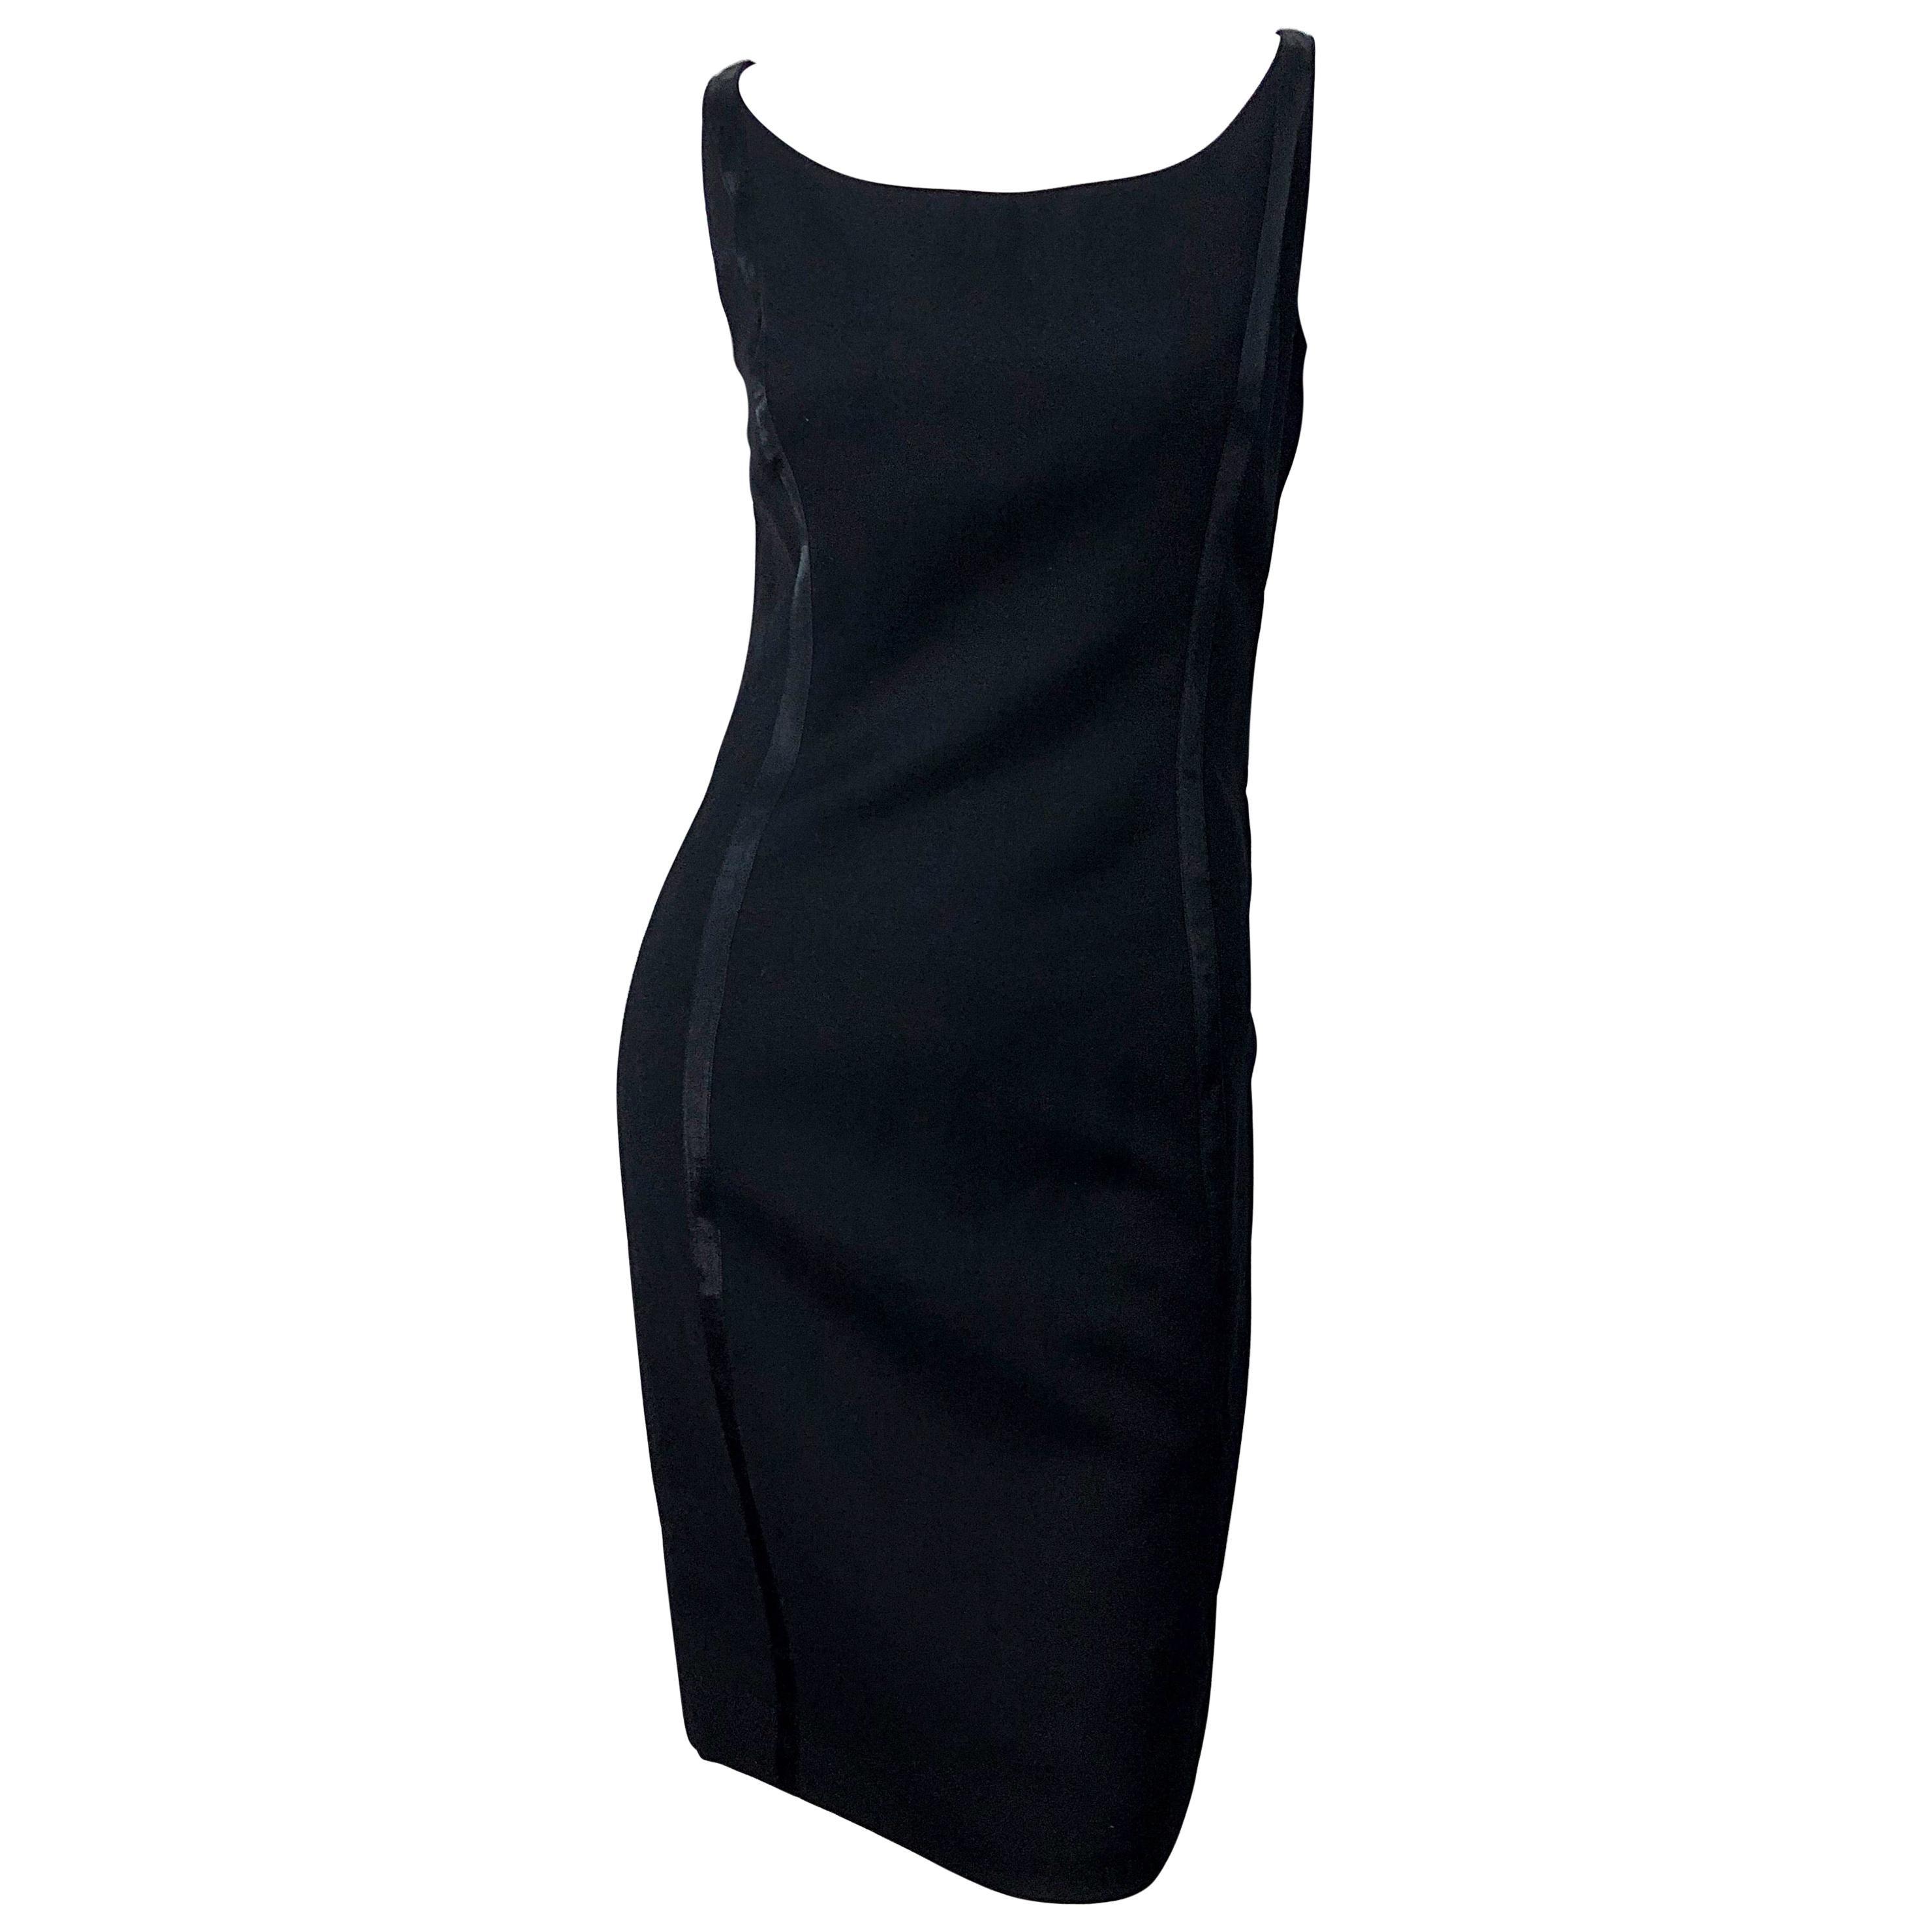 NWT 1990s Claude Montana Size 6 Vintage 90s Sleeveless Little Black Dress